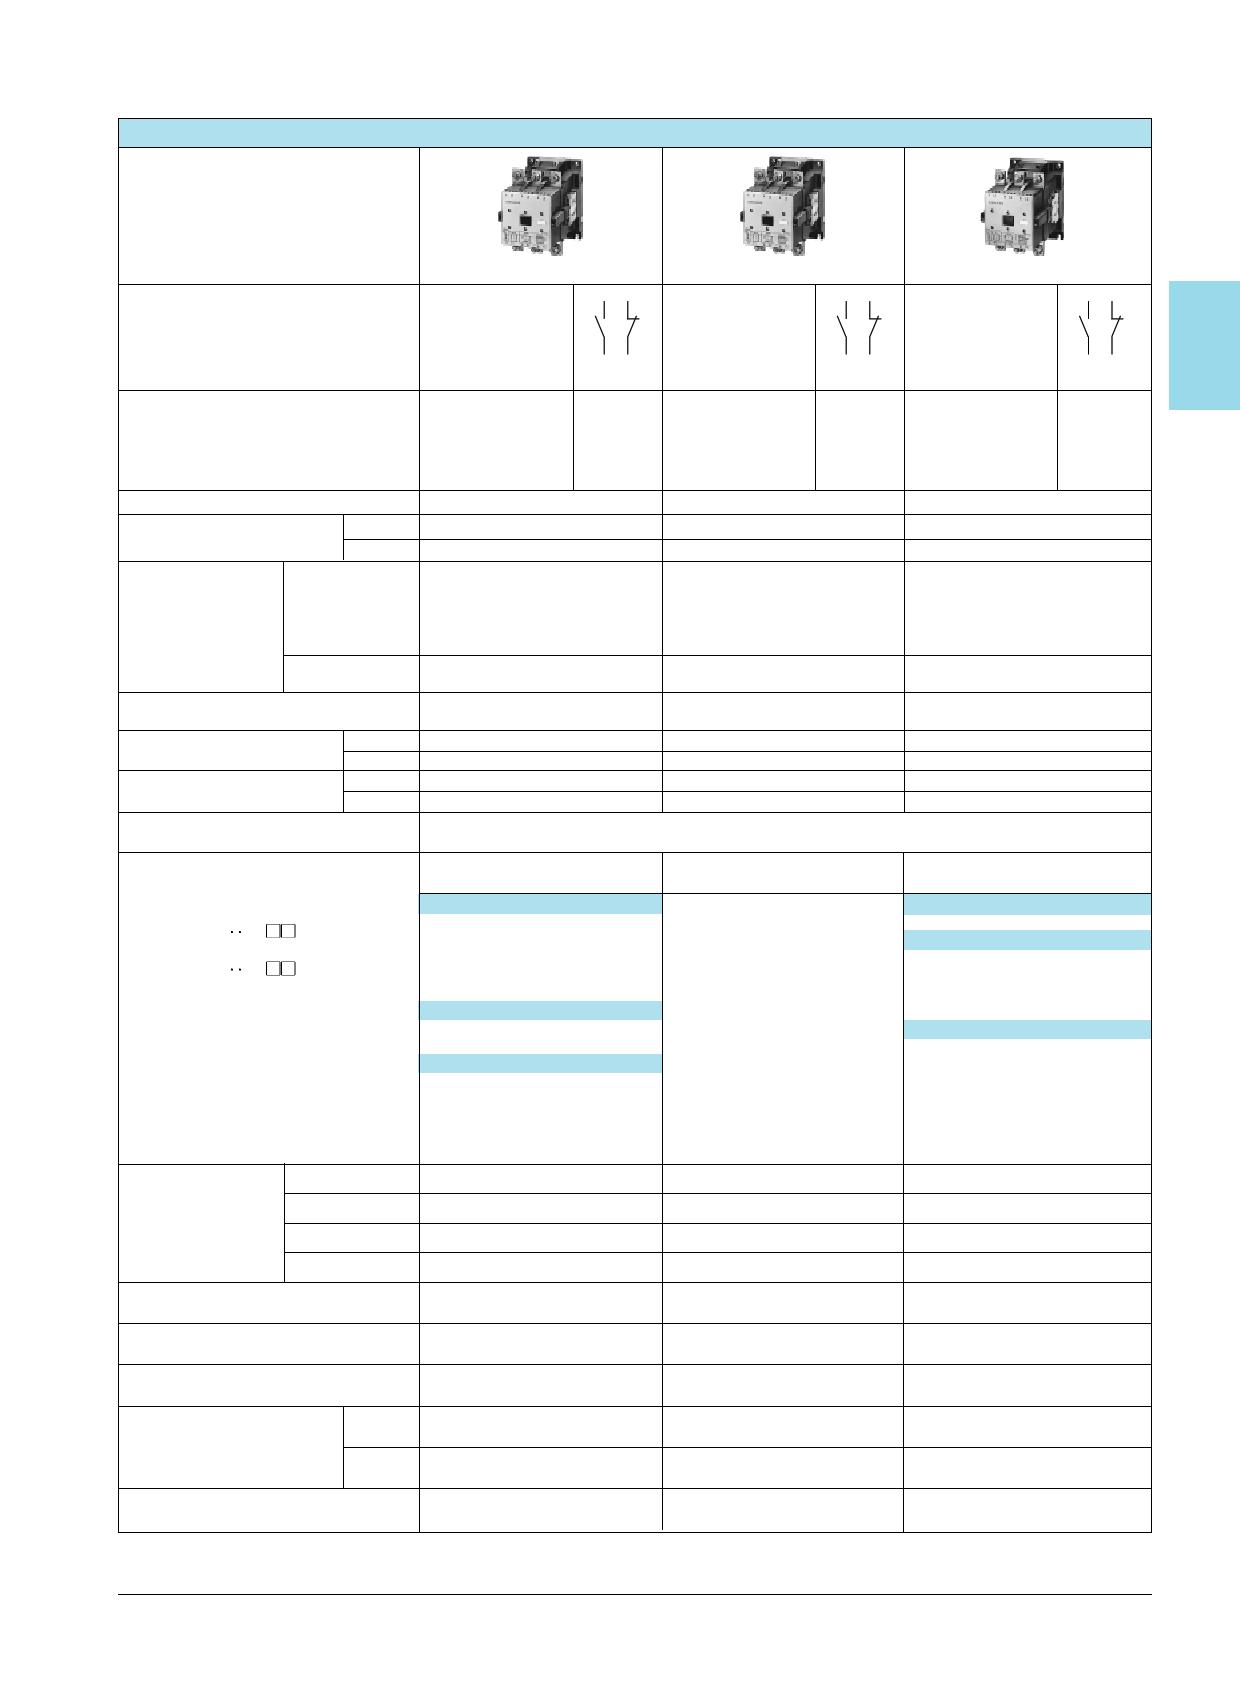 3TF32 Datasheet, Funktion